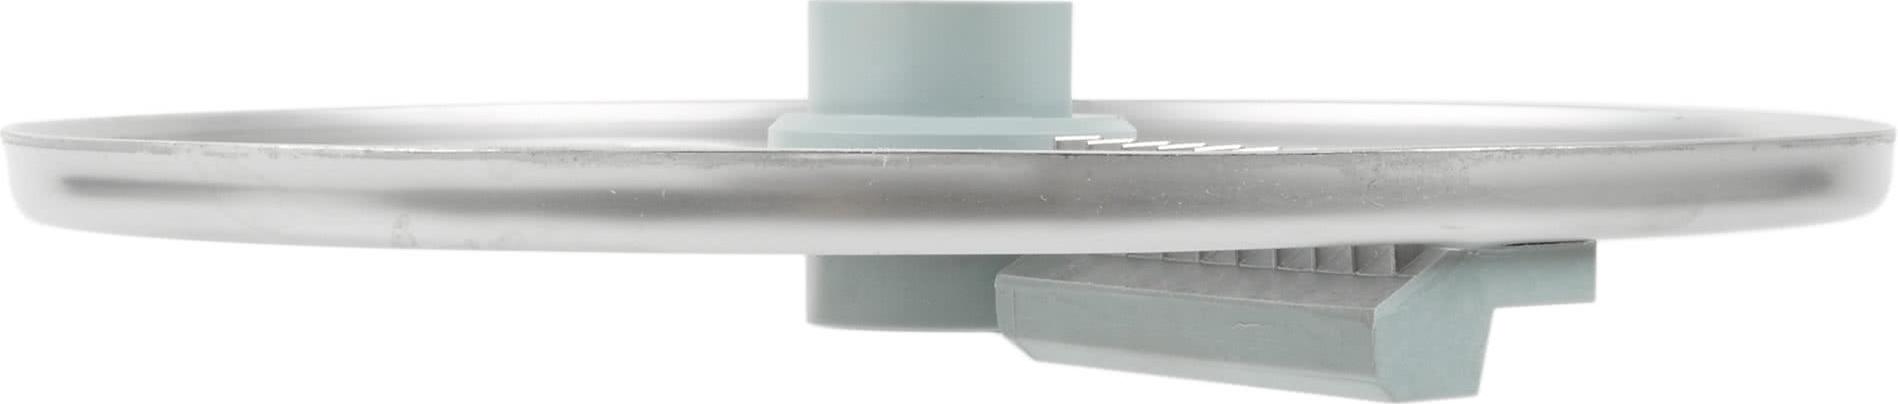 Диск-соломка Robot Coupe 27610 (6x6 мм) - 3